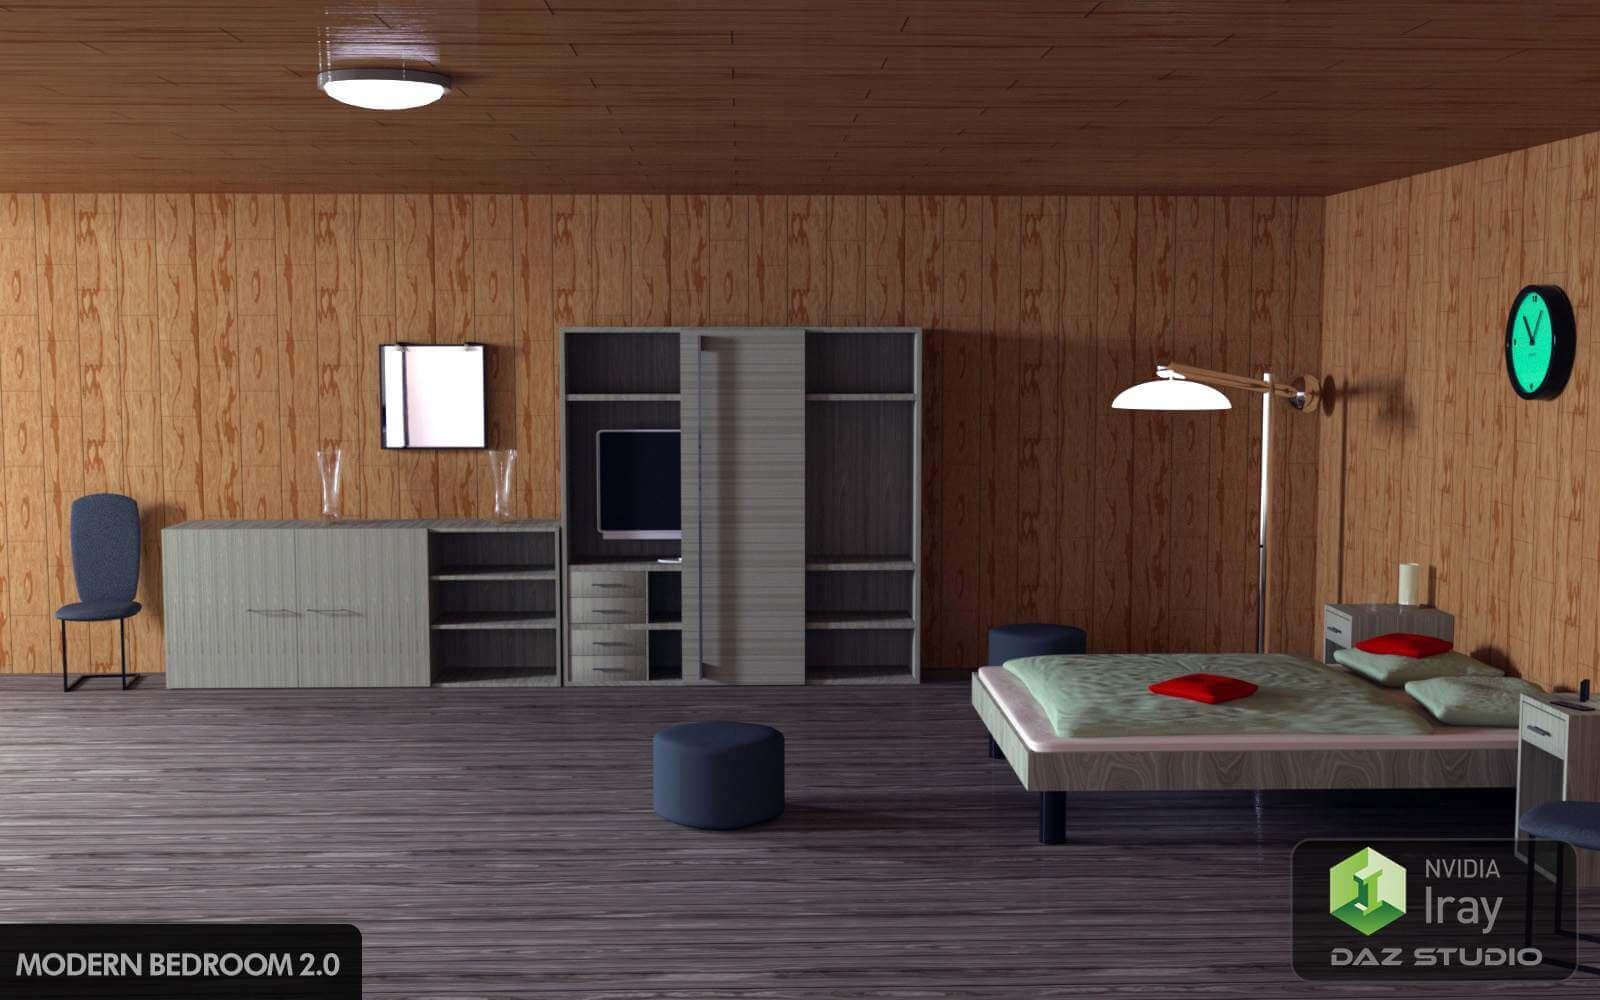 Modern Bedroom 2.0